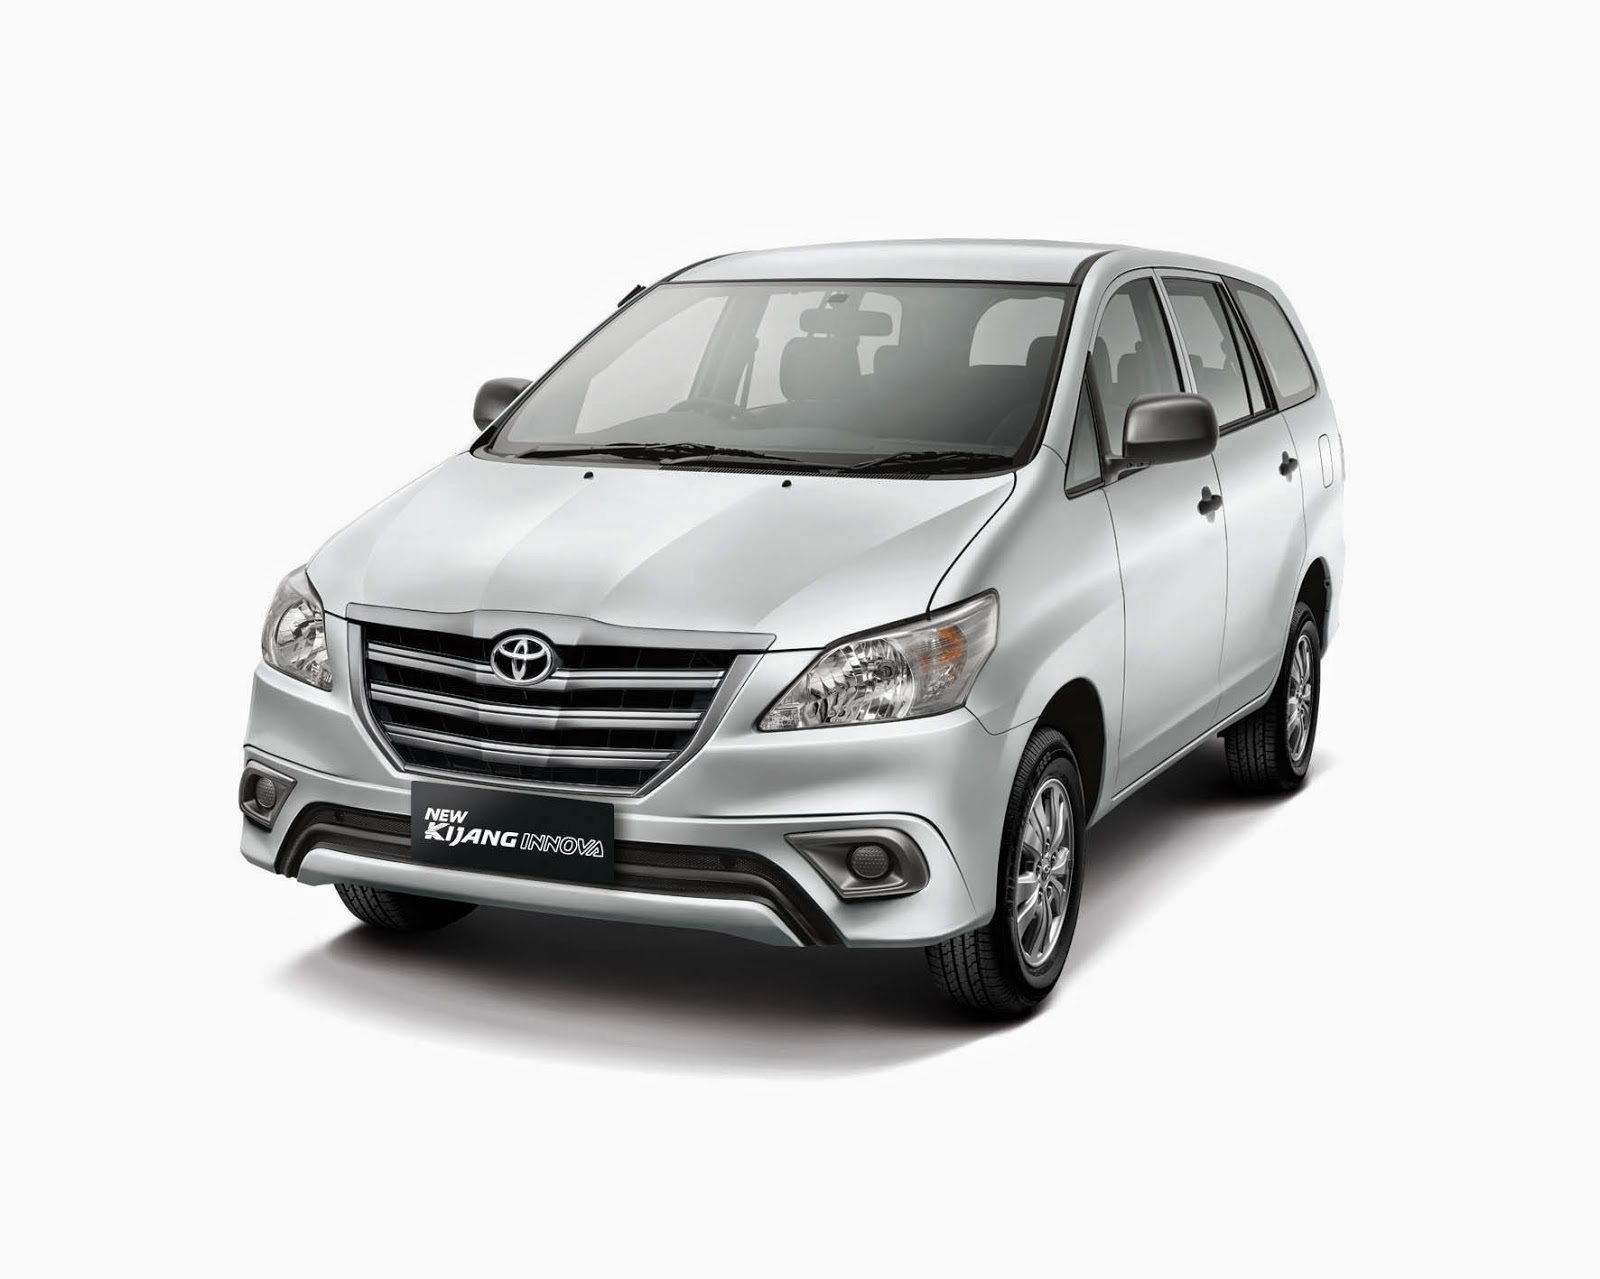 all new kijang innova 2.4 g at diesel vs pajero sport toyota lampung auto 2000 rajabasa